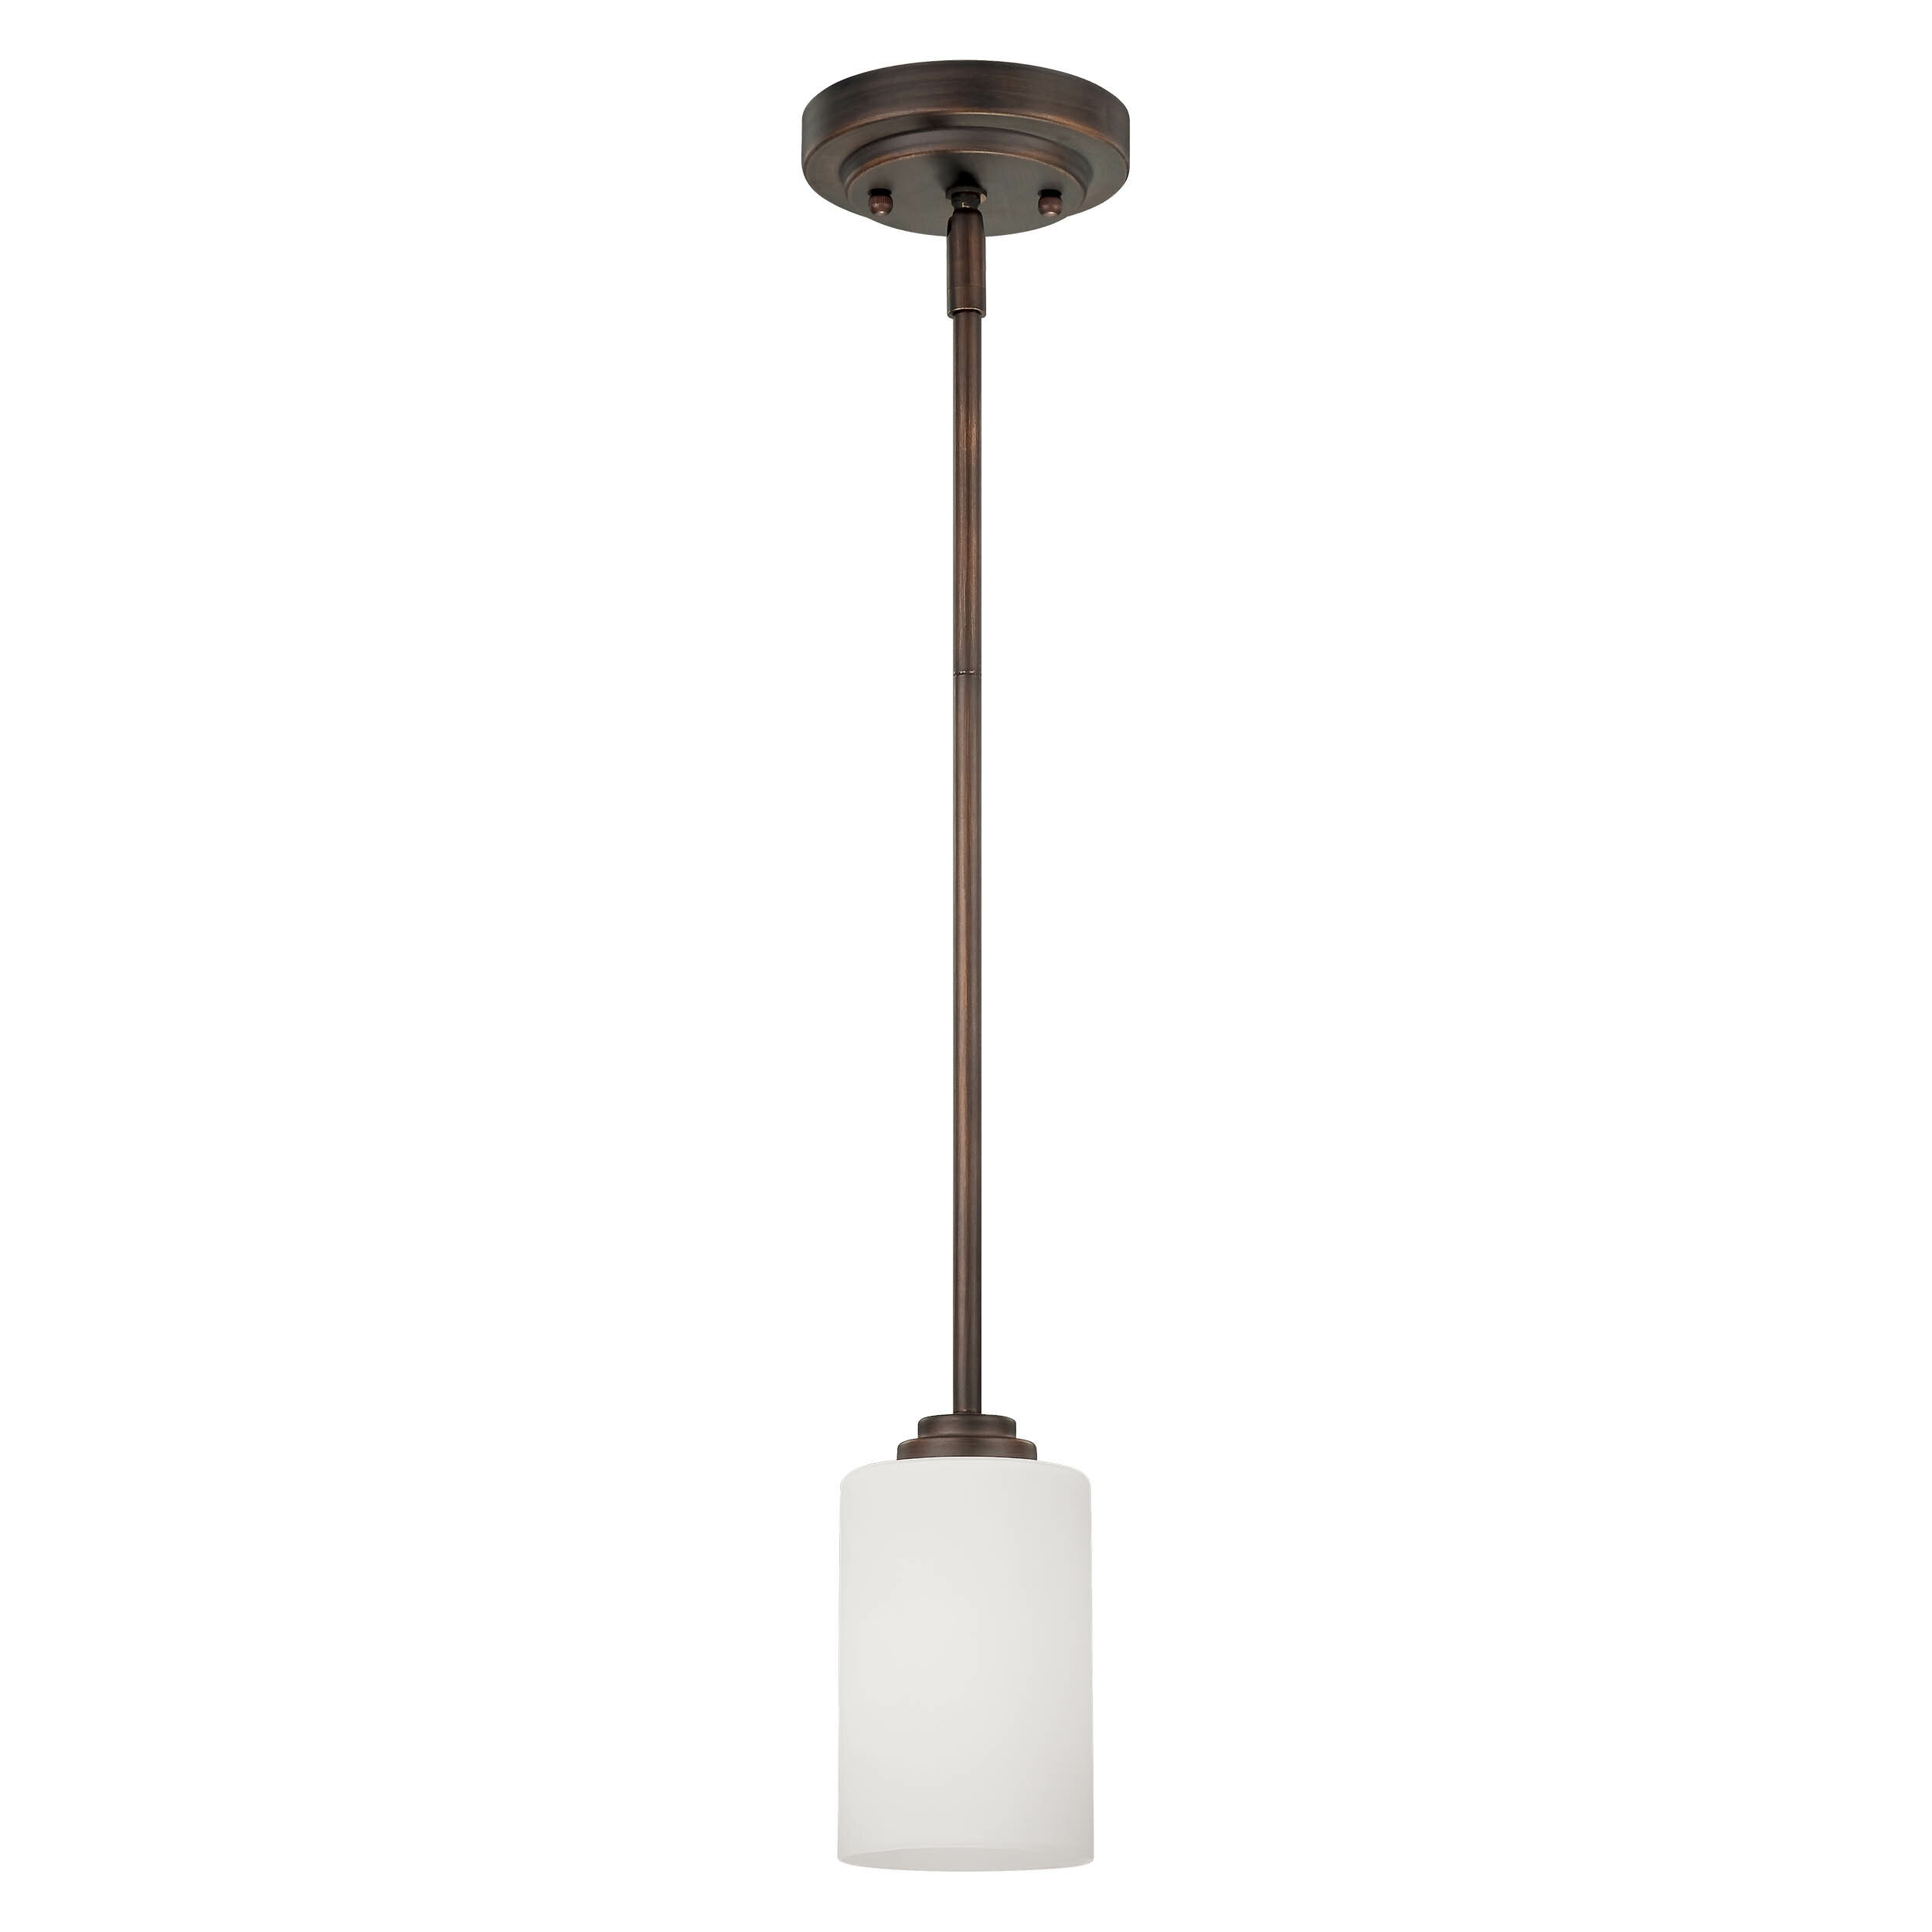 Castano 1 Light Single Cylinder Pendant Regarding Erico 1 Light Single Bell Pendants (View 21 of 30)